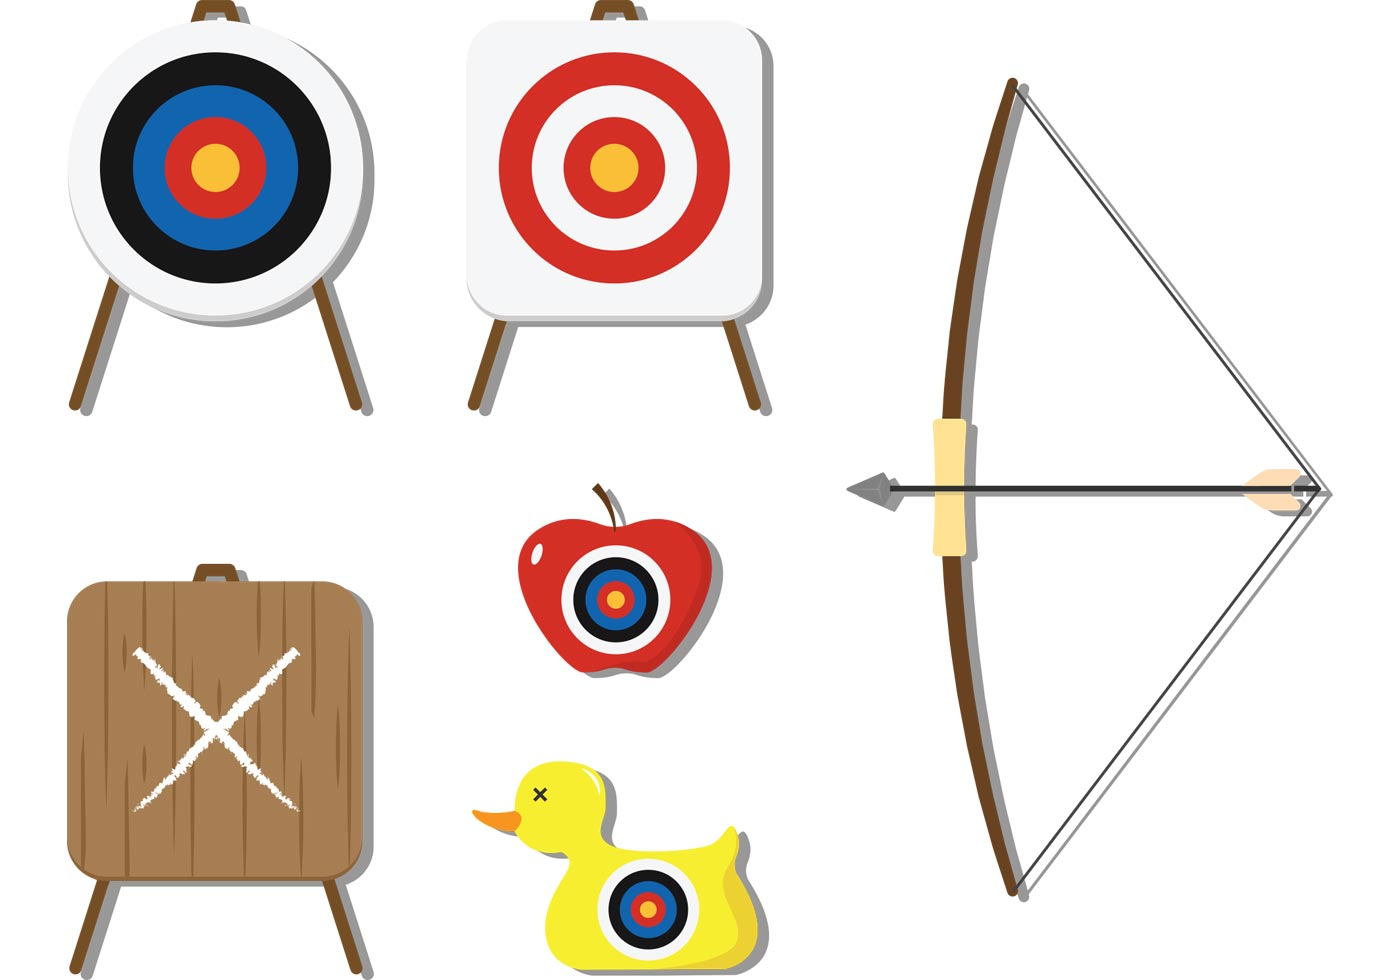 Archery And Target Vectors Download Free Vector Art